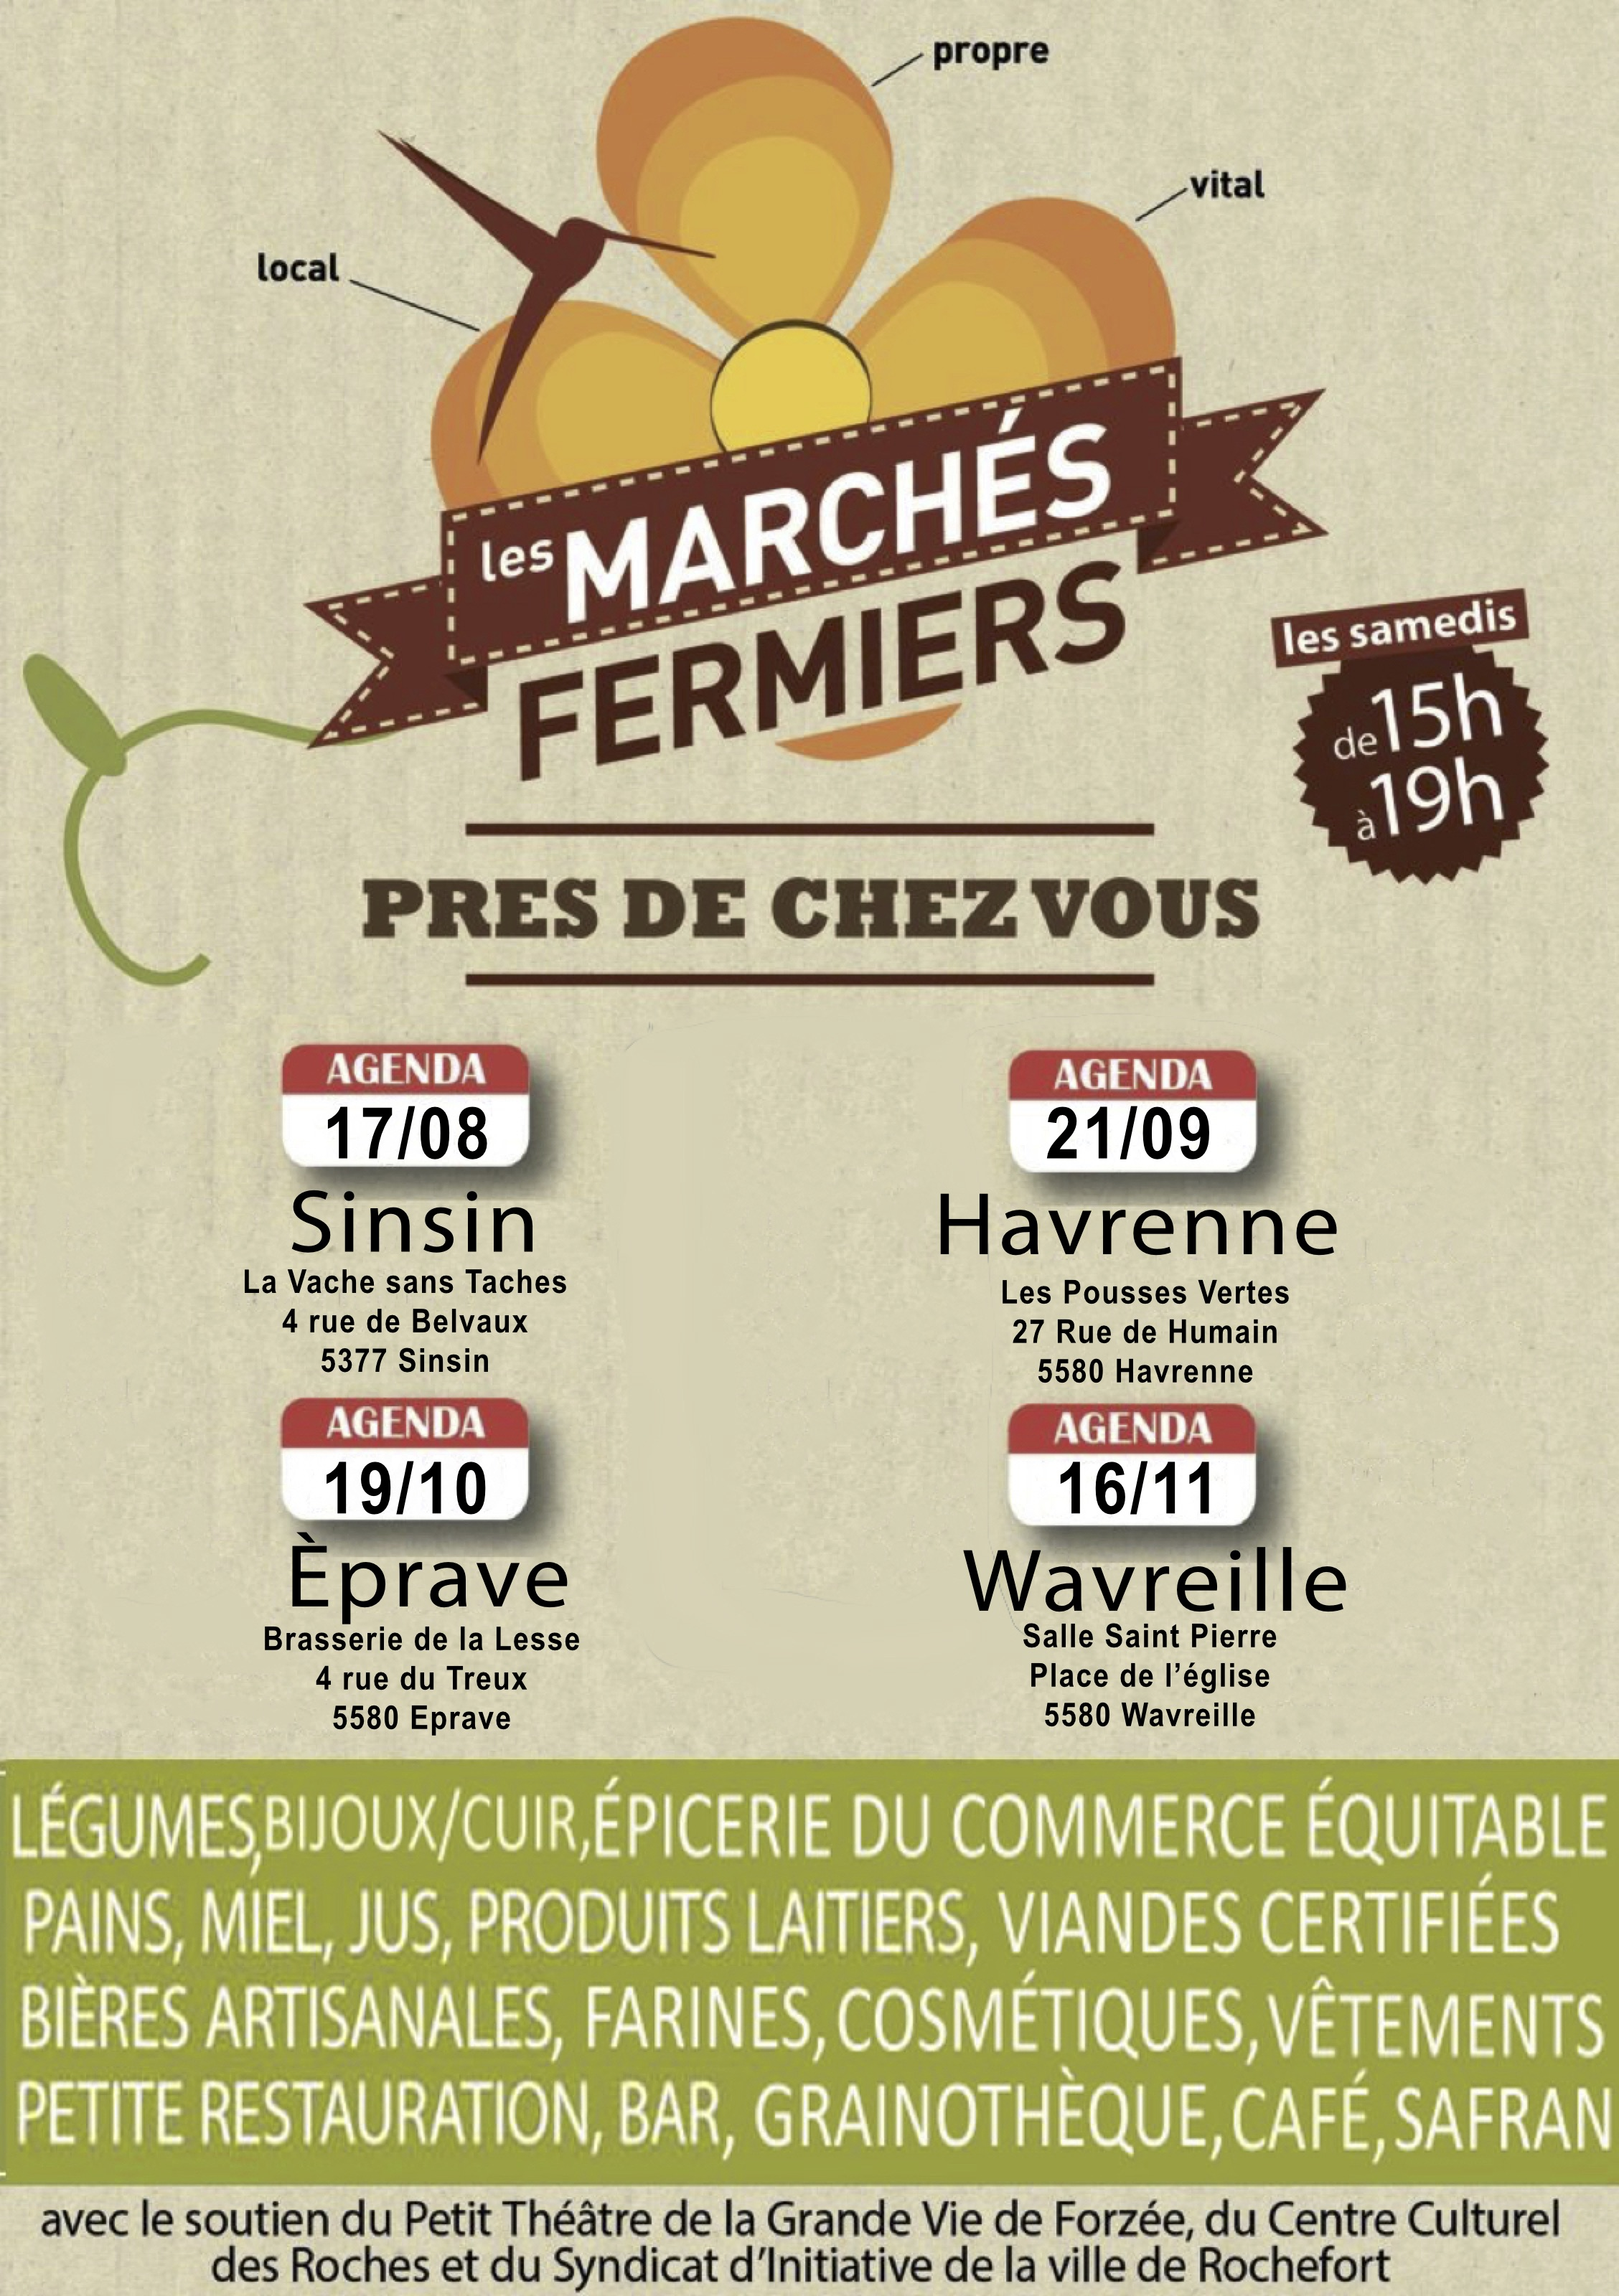 image marches_fermiers_aot_septembre.jpg (1.2MB)